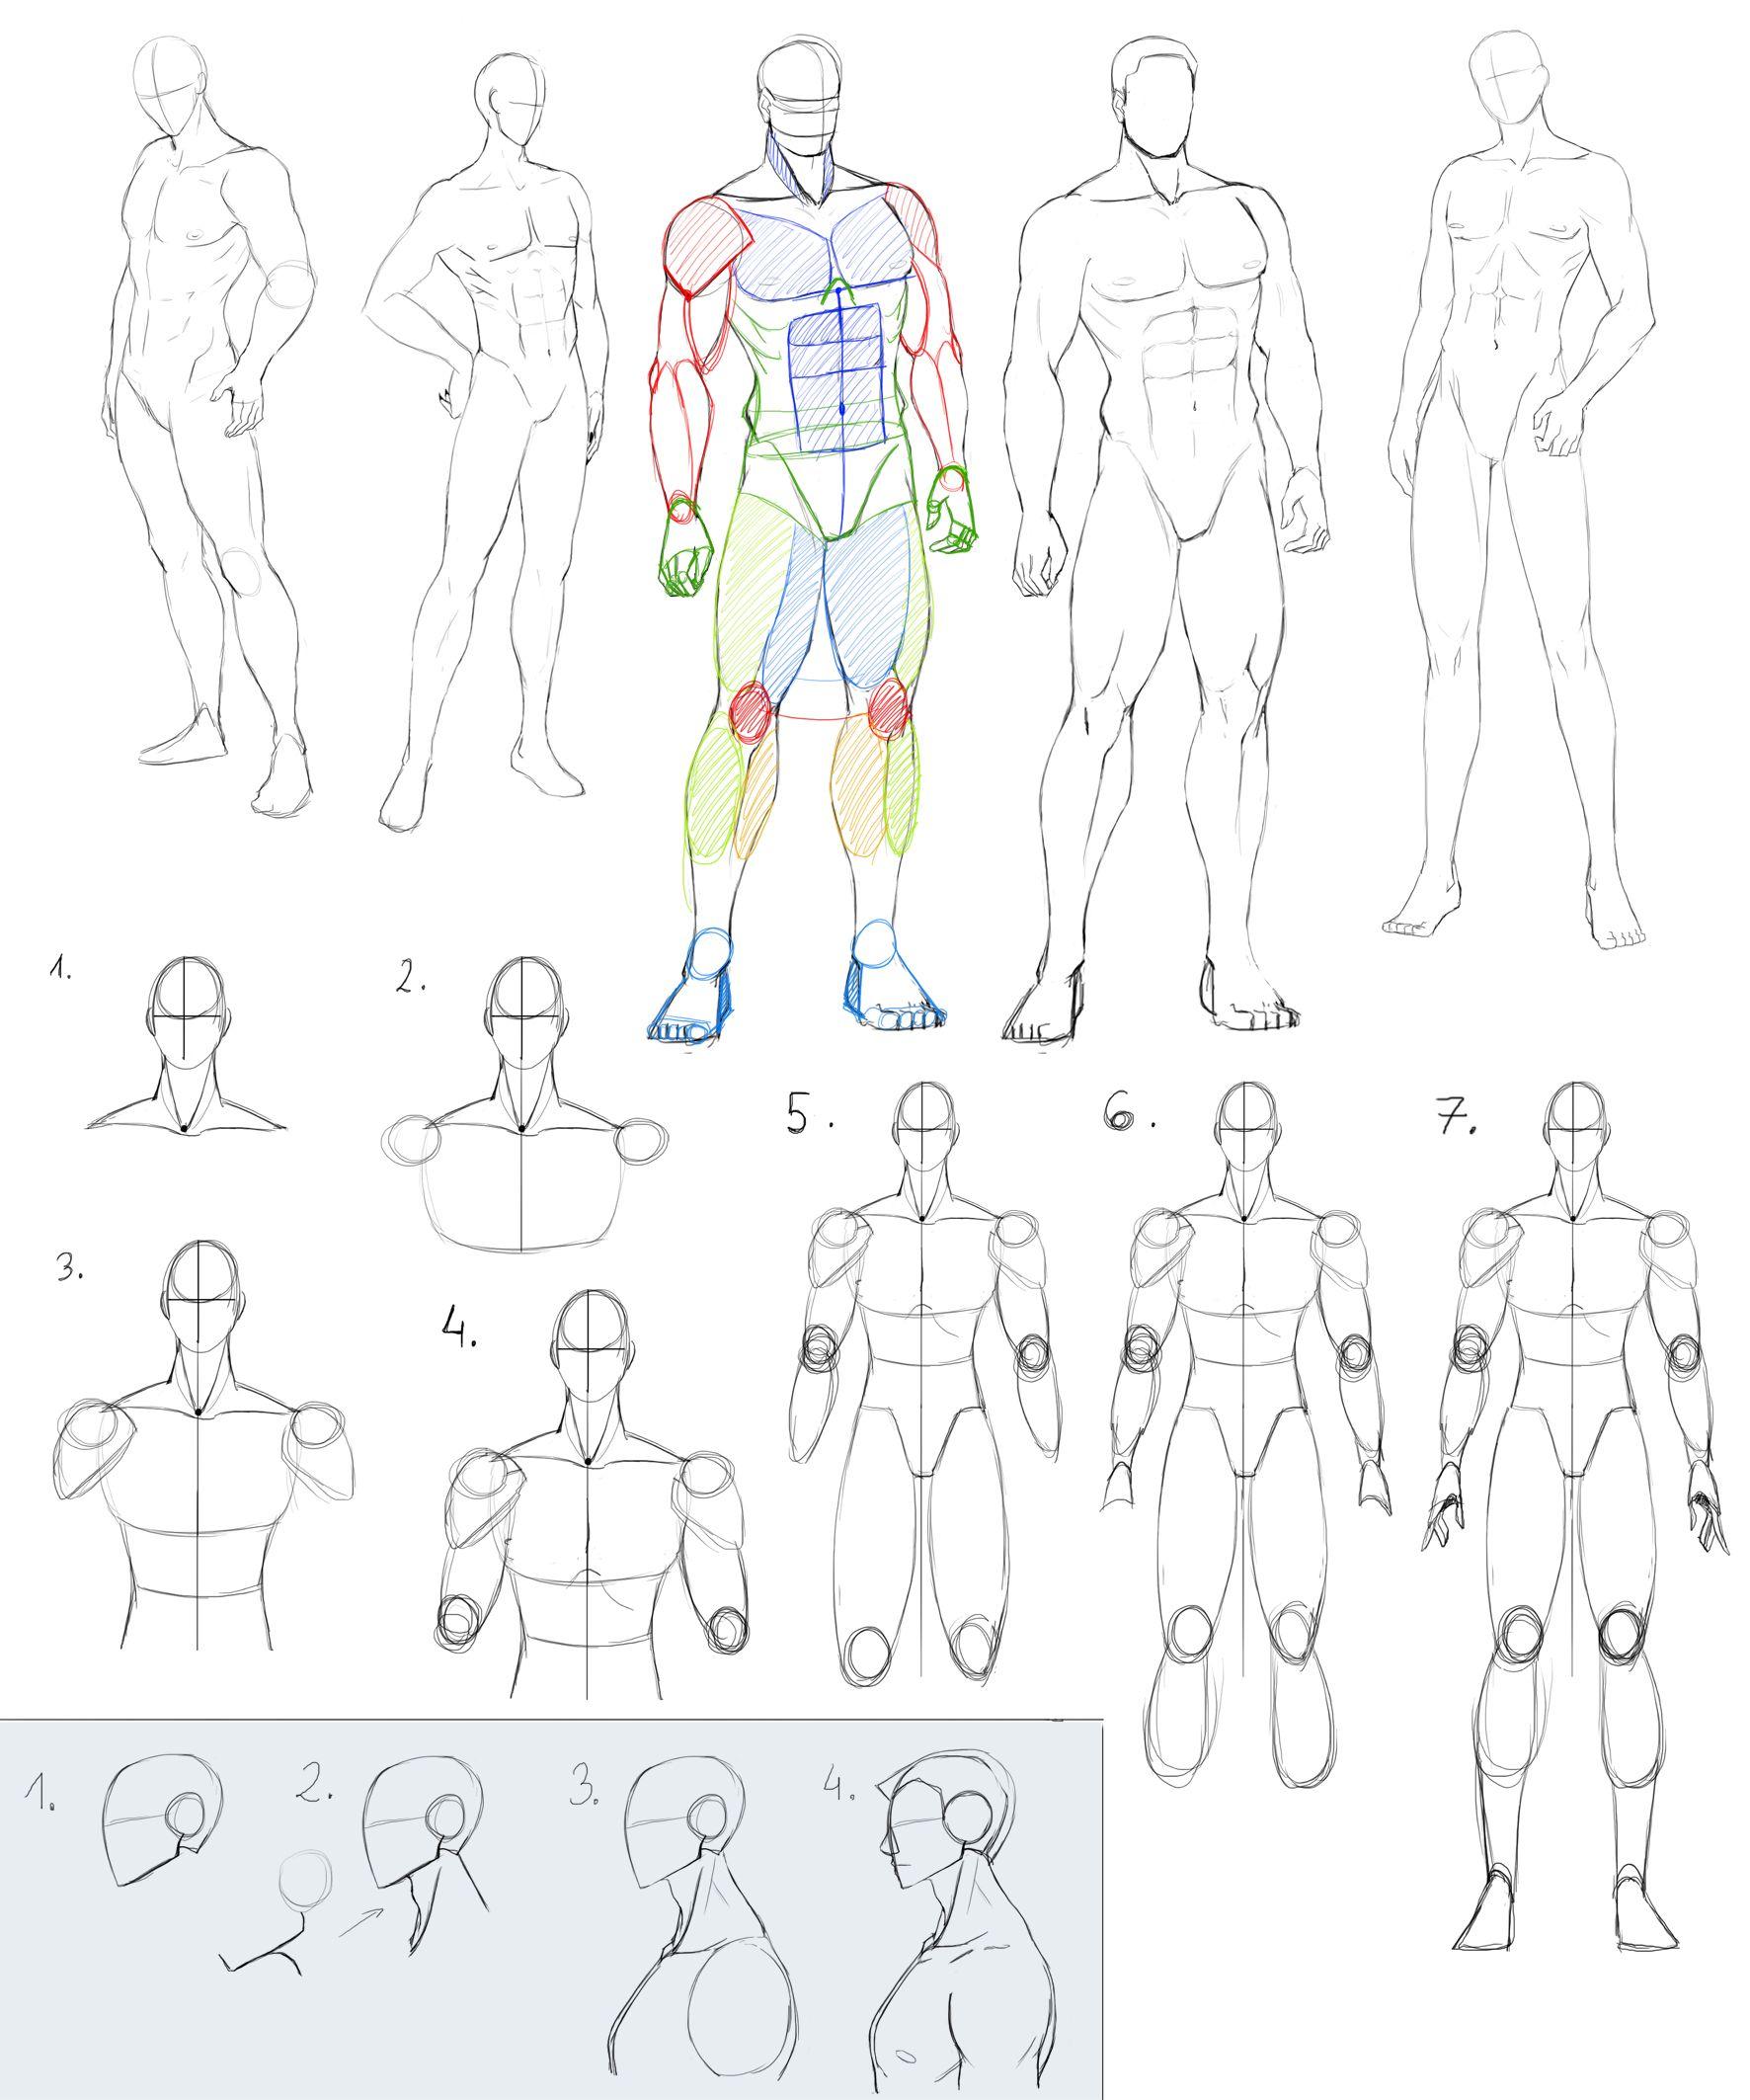 Male Antomy 2 by Precia-T.deviantart.com on @deviantART | Drawing ...